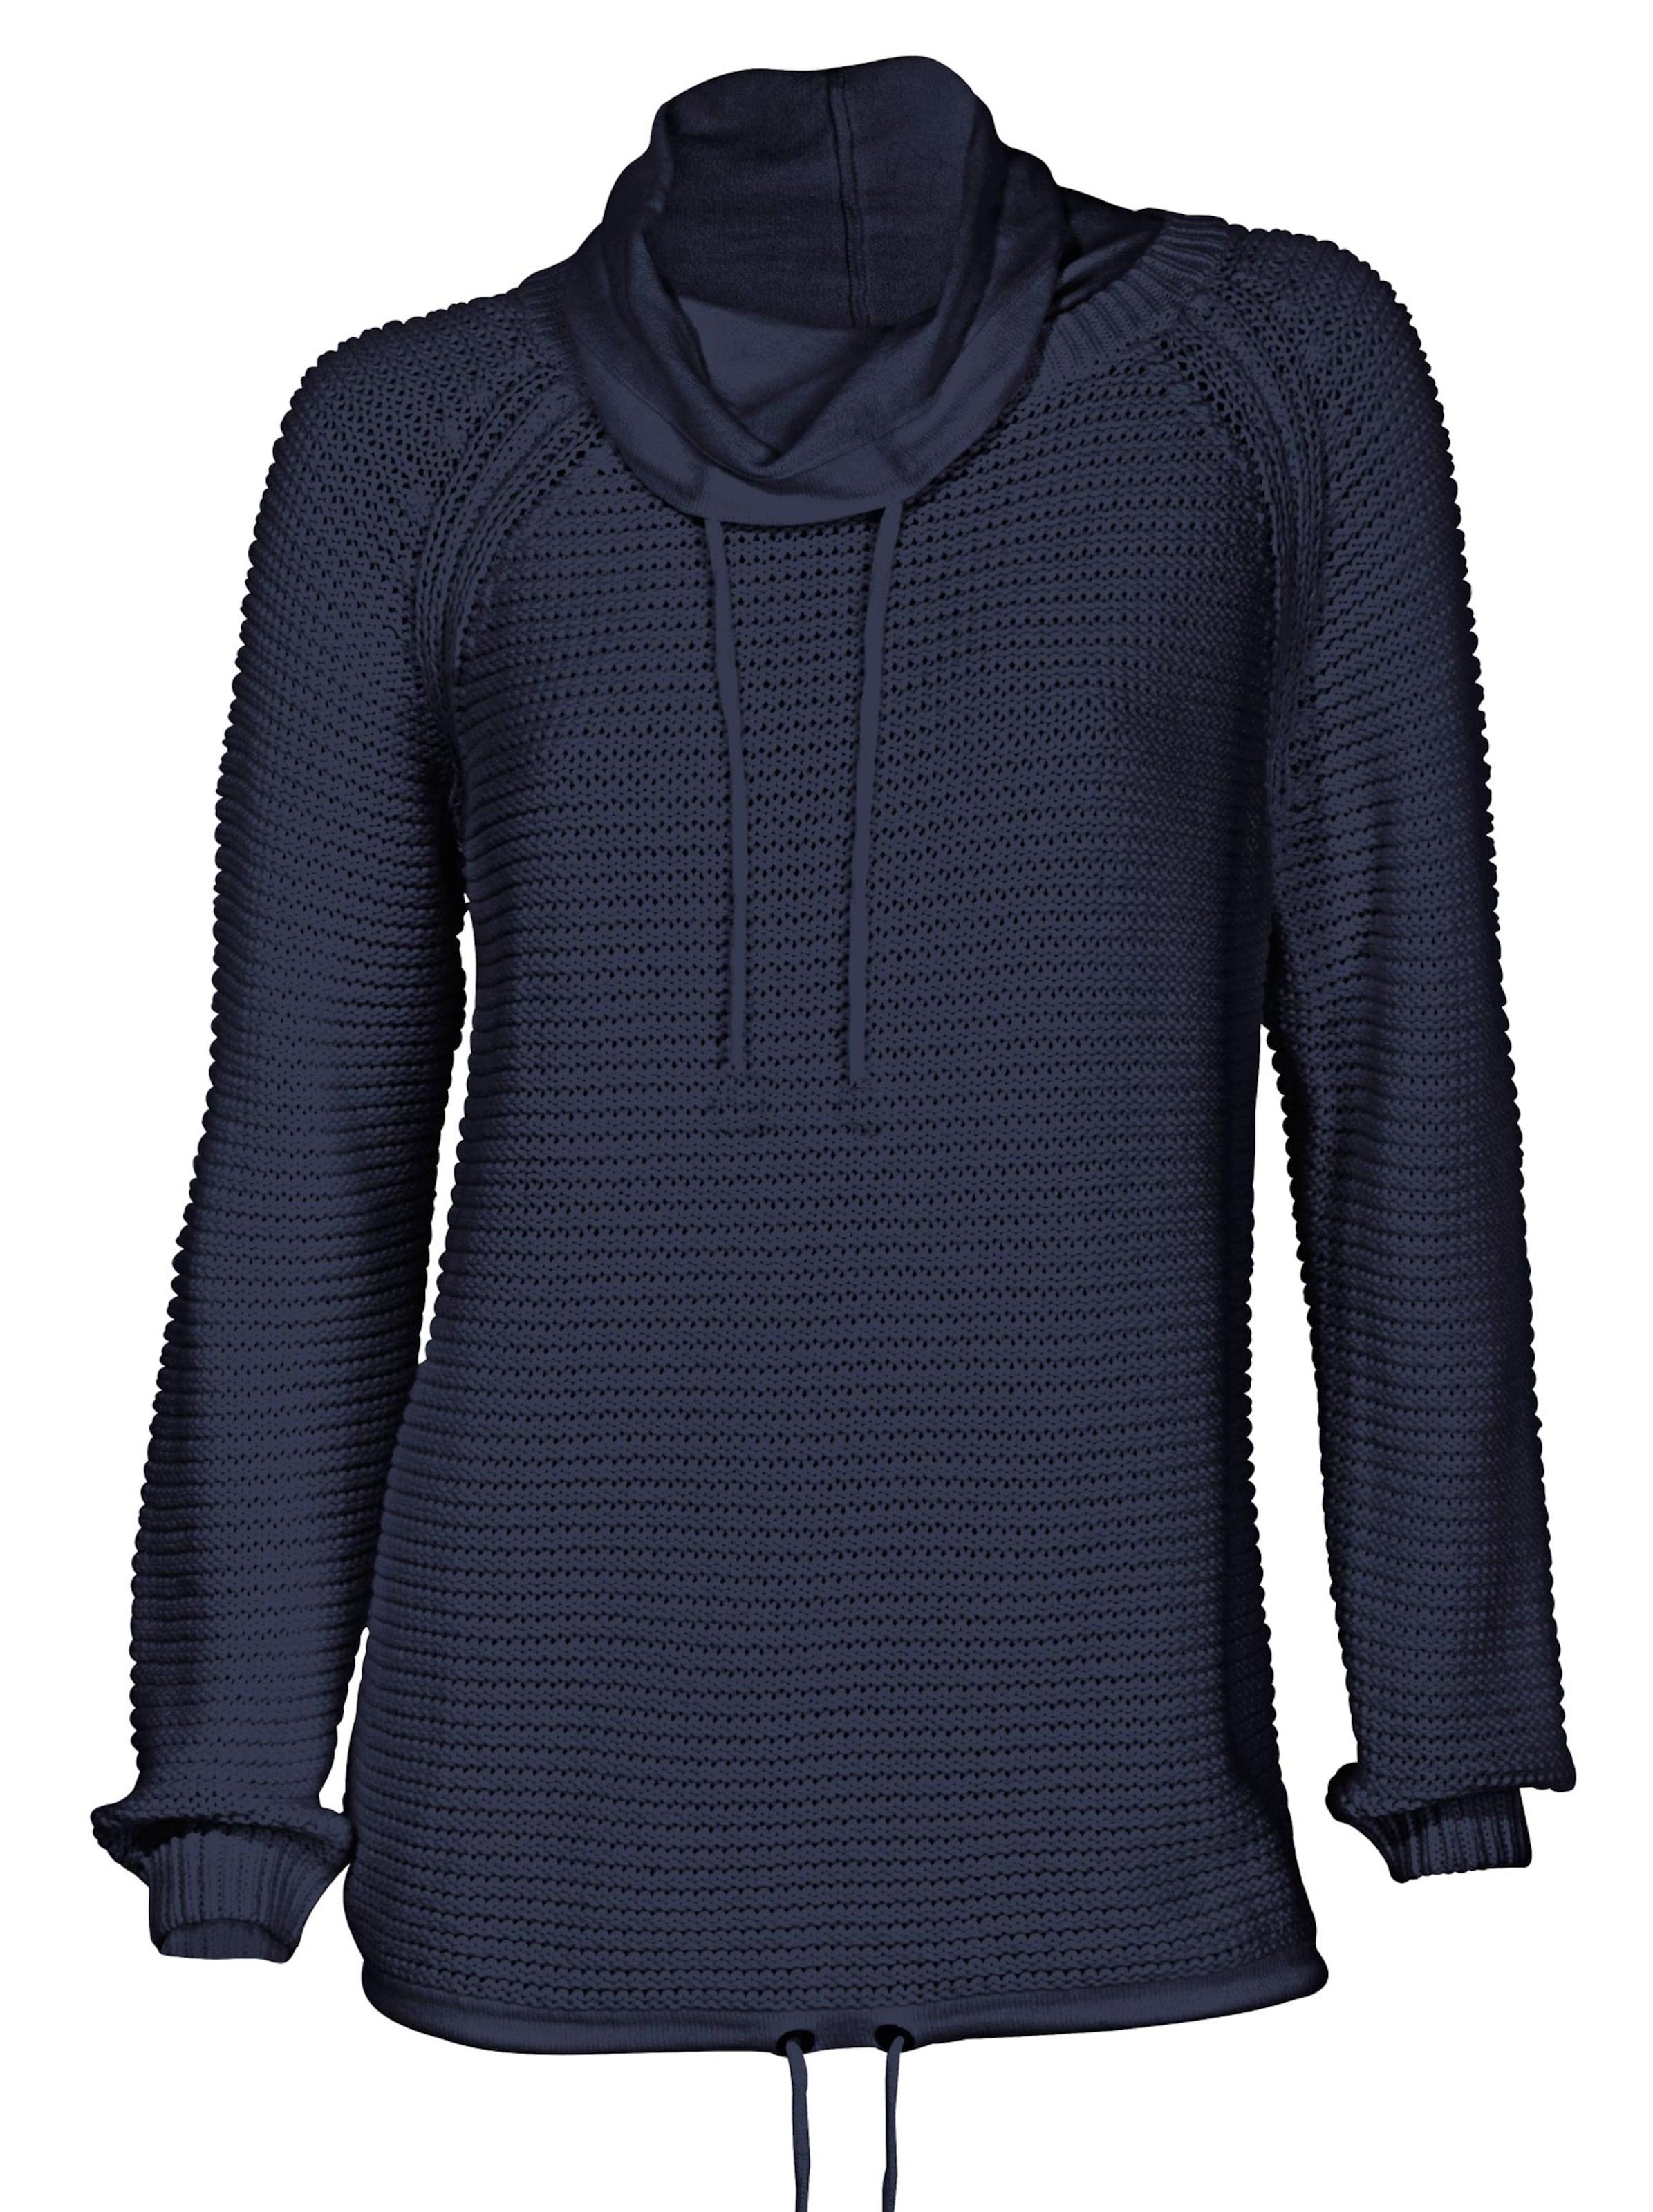 witt weiden -  Damen Pullover marine